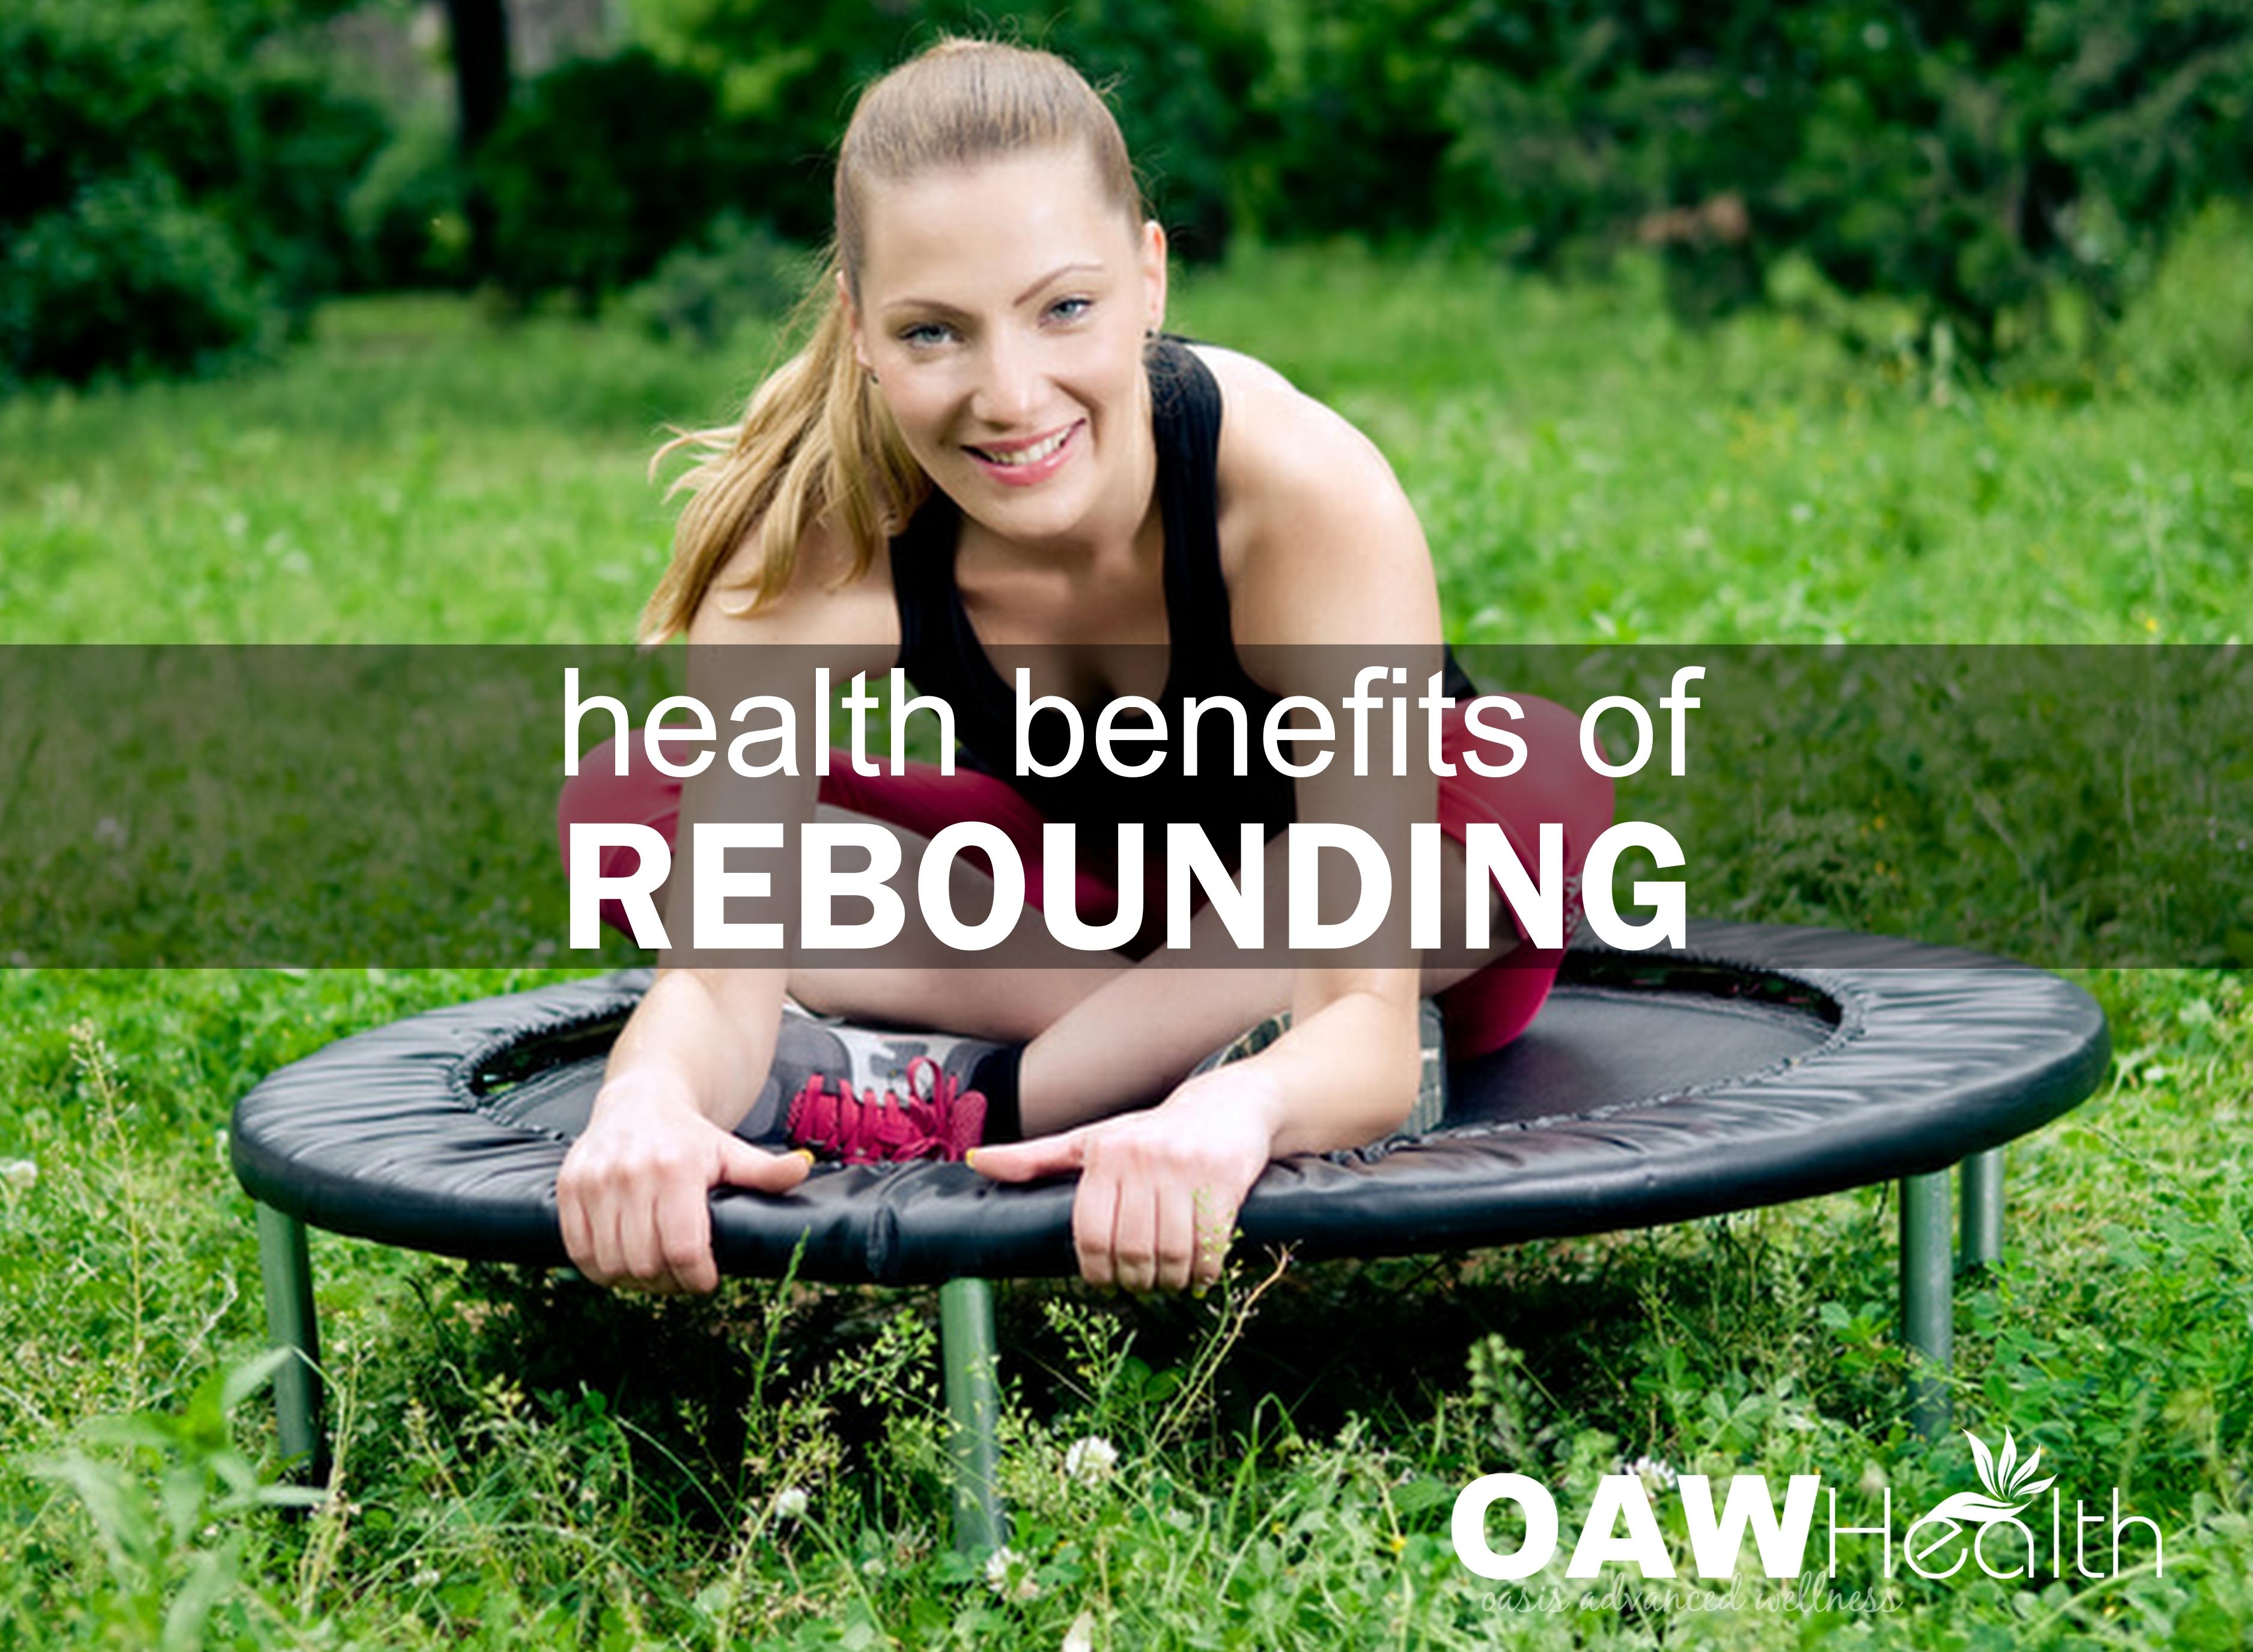 Amazing Health Benefits of Rebounding